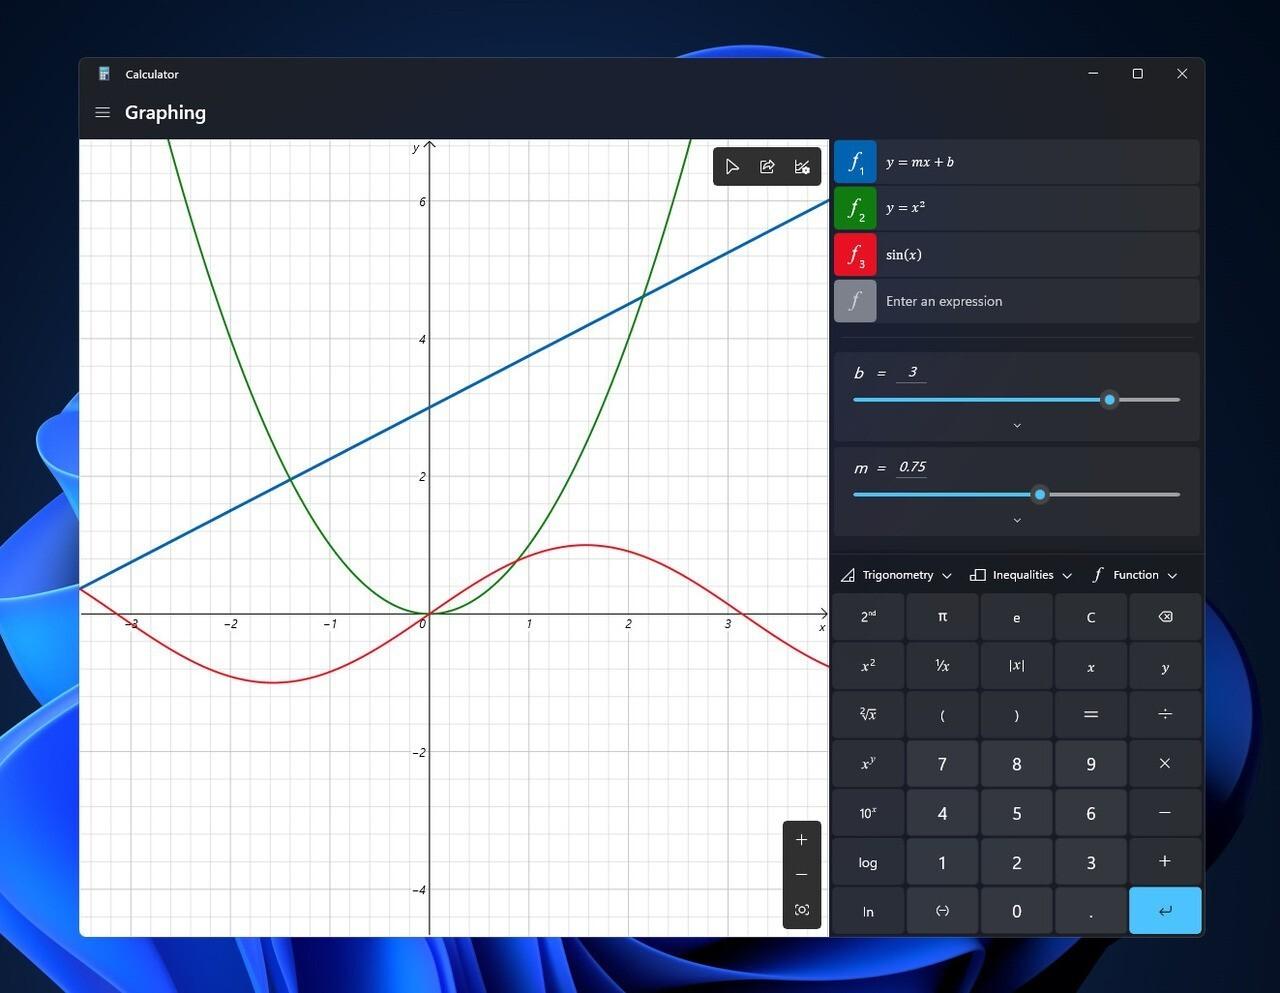 CalculatorGraphing